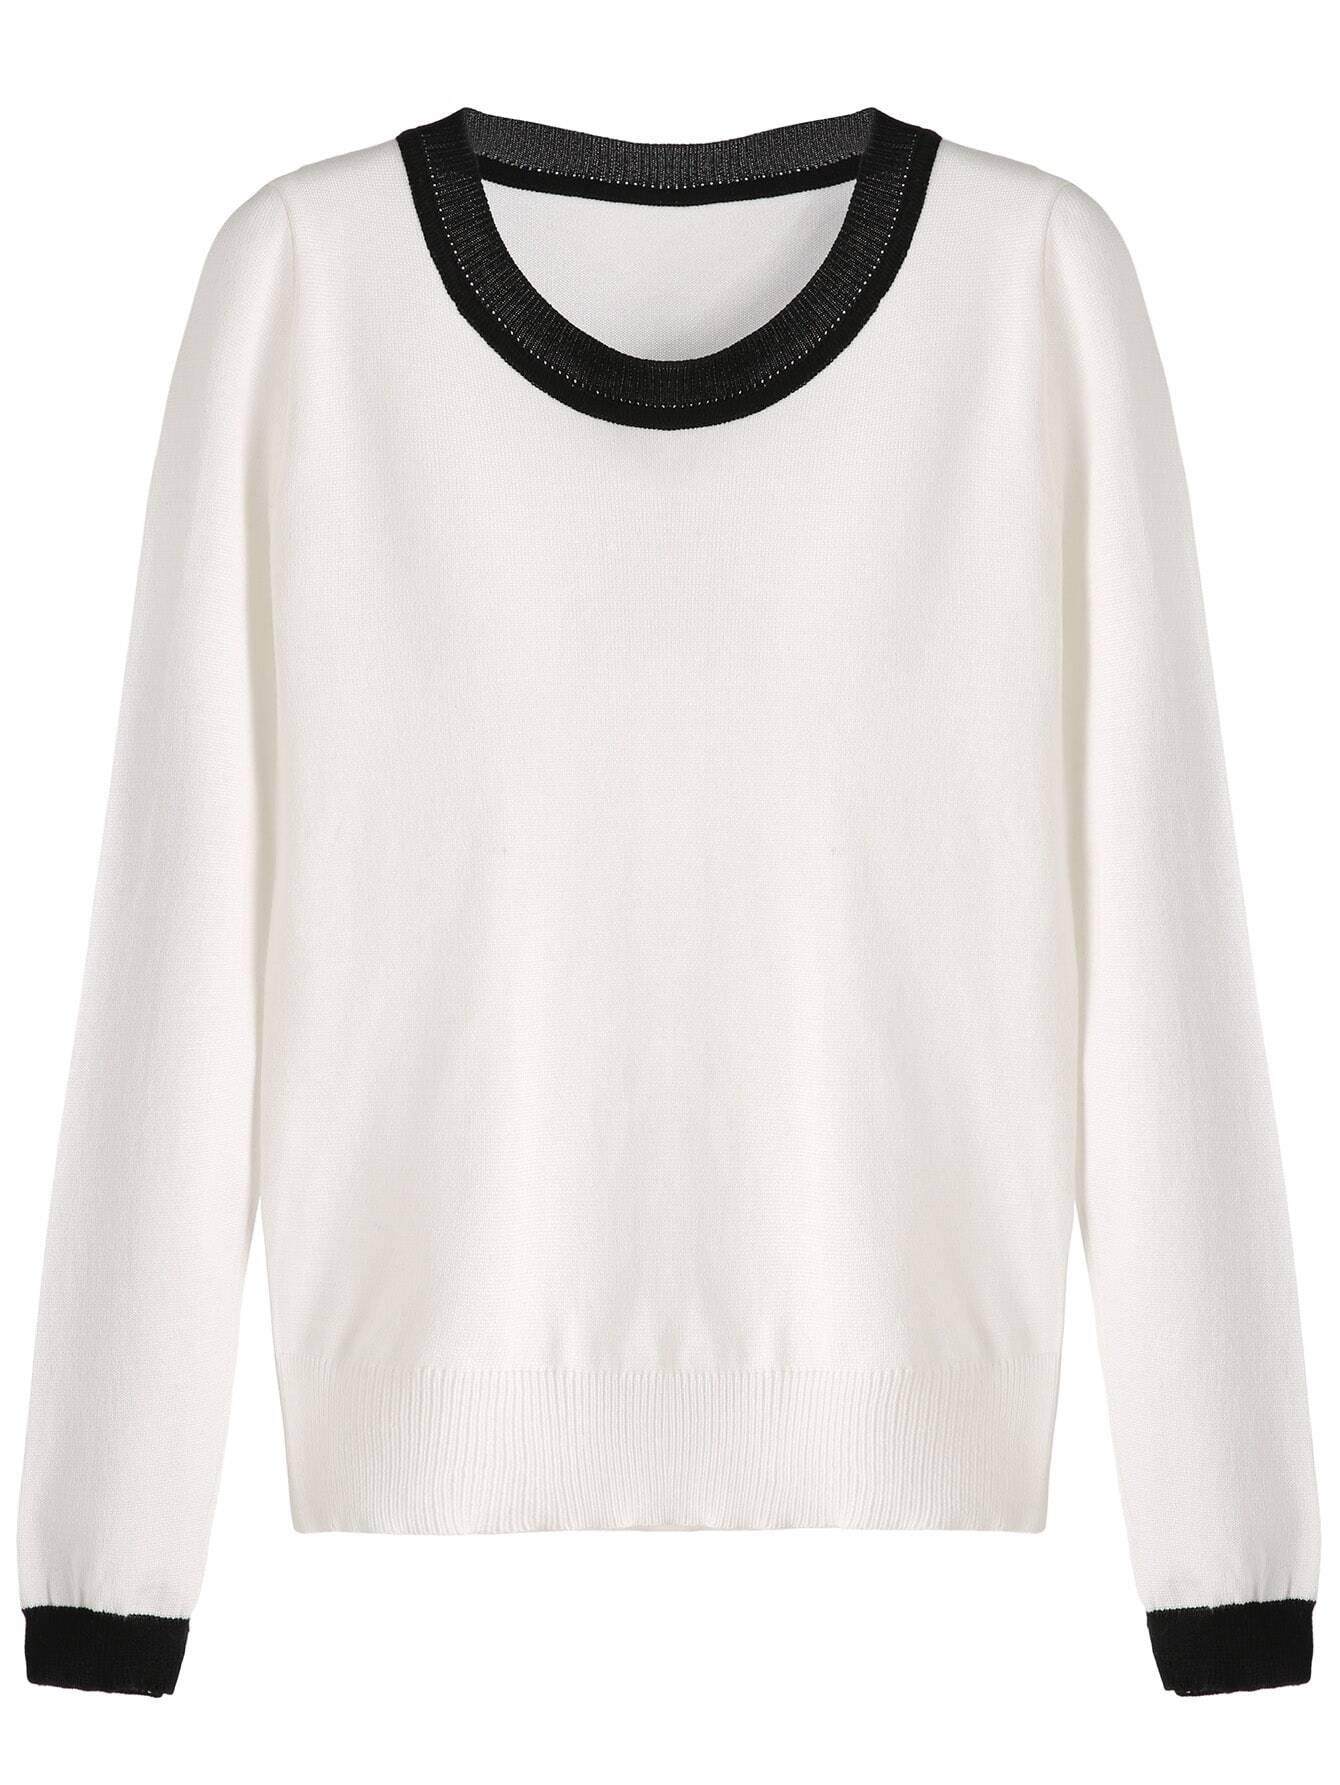 White Contrast Trim Knitwear